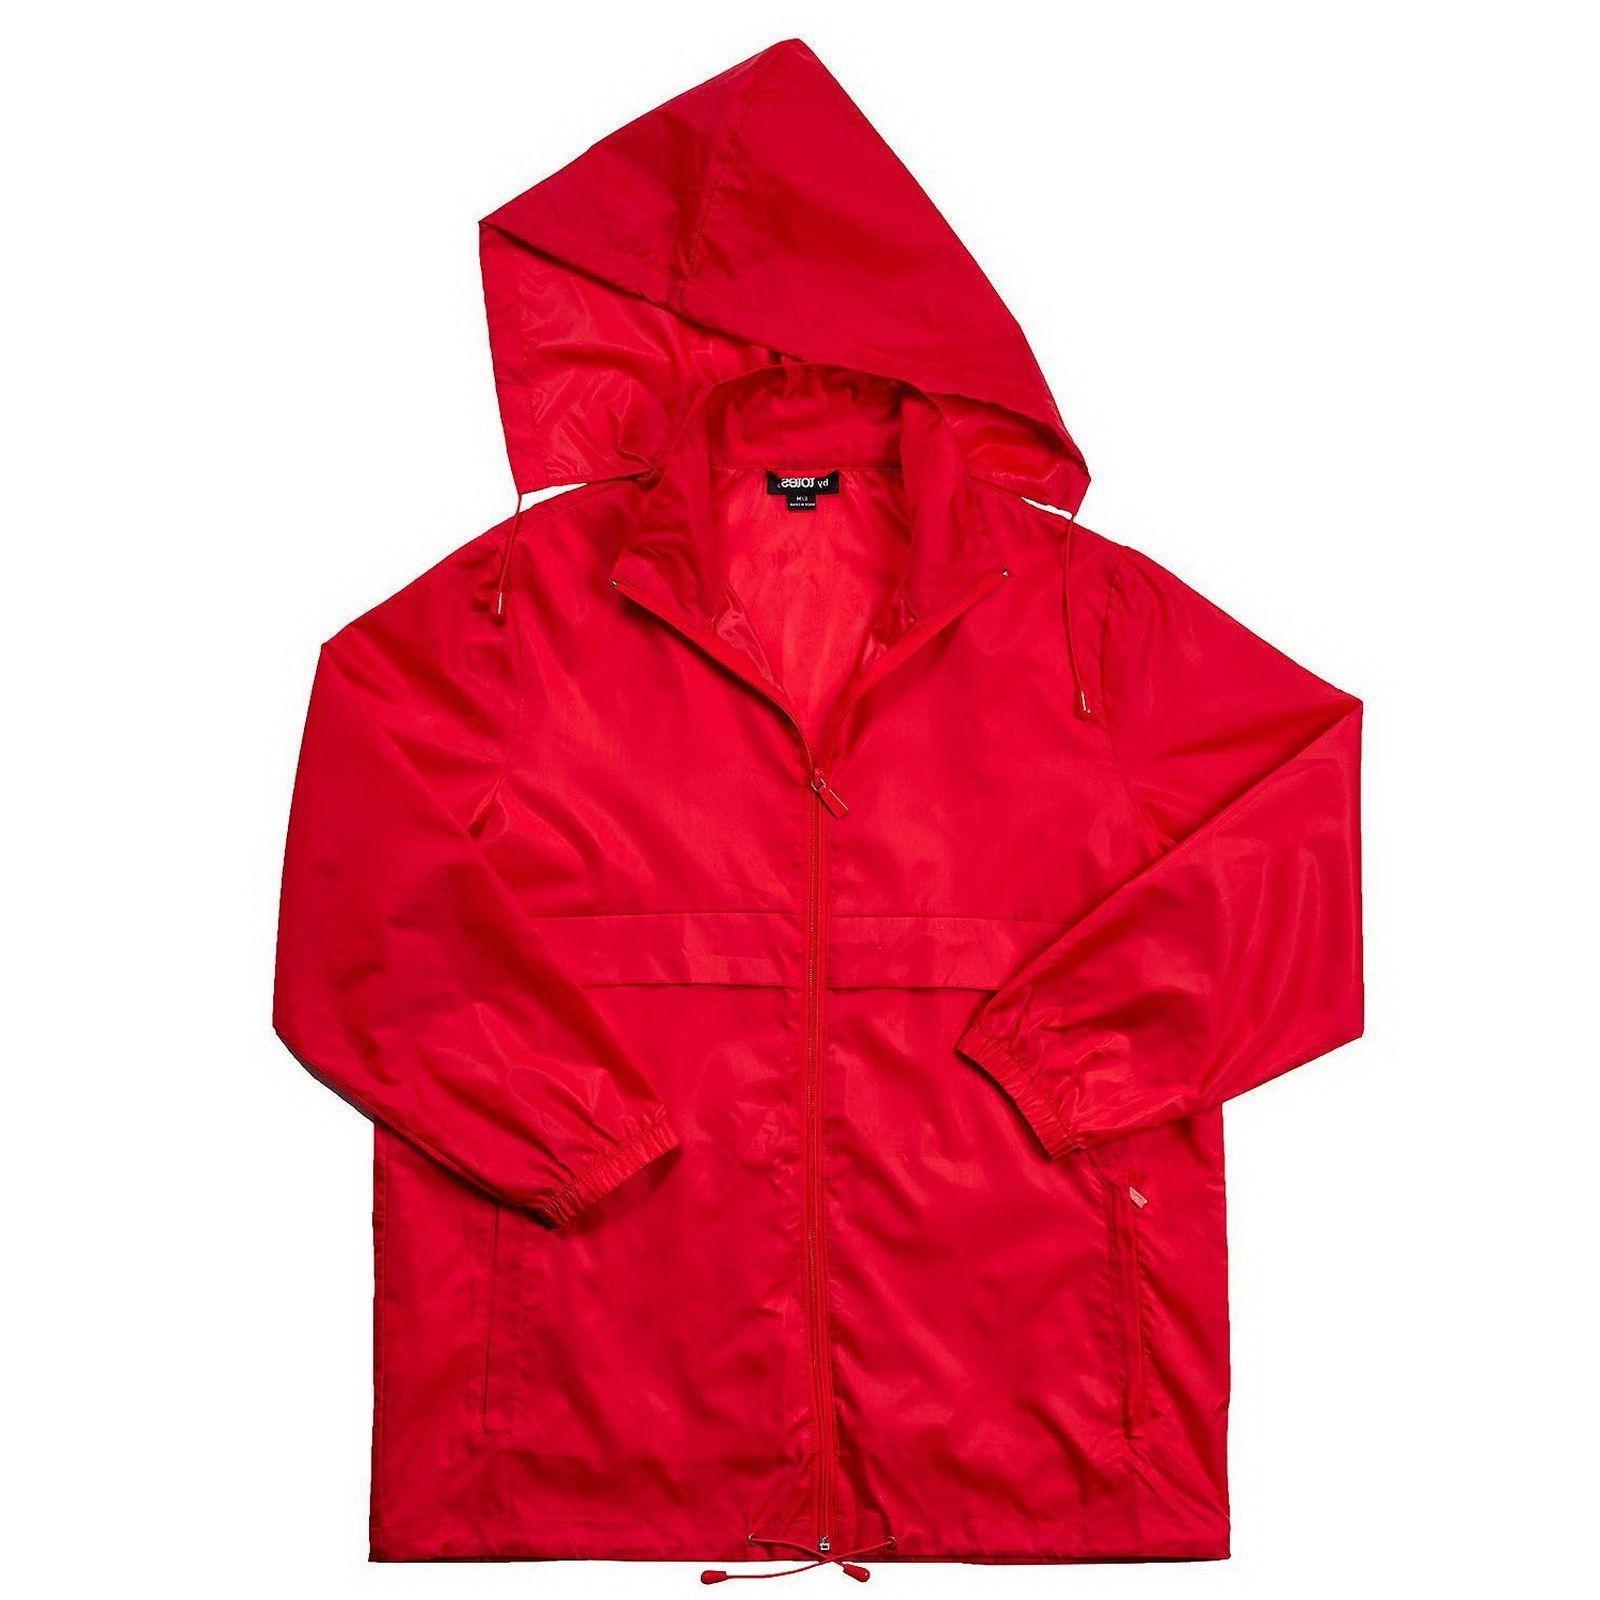 Packable Women's Rain Coat Totes Anorak Poncho Jacket w/ Hoo